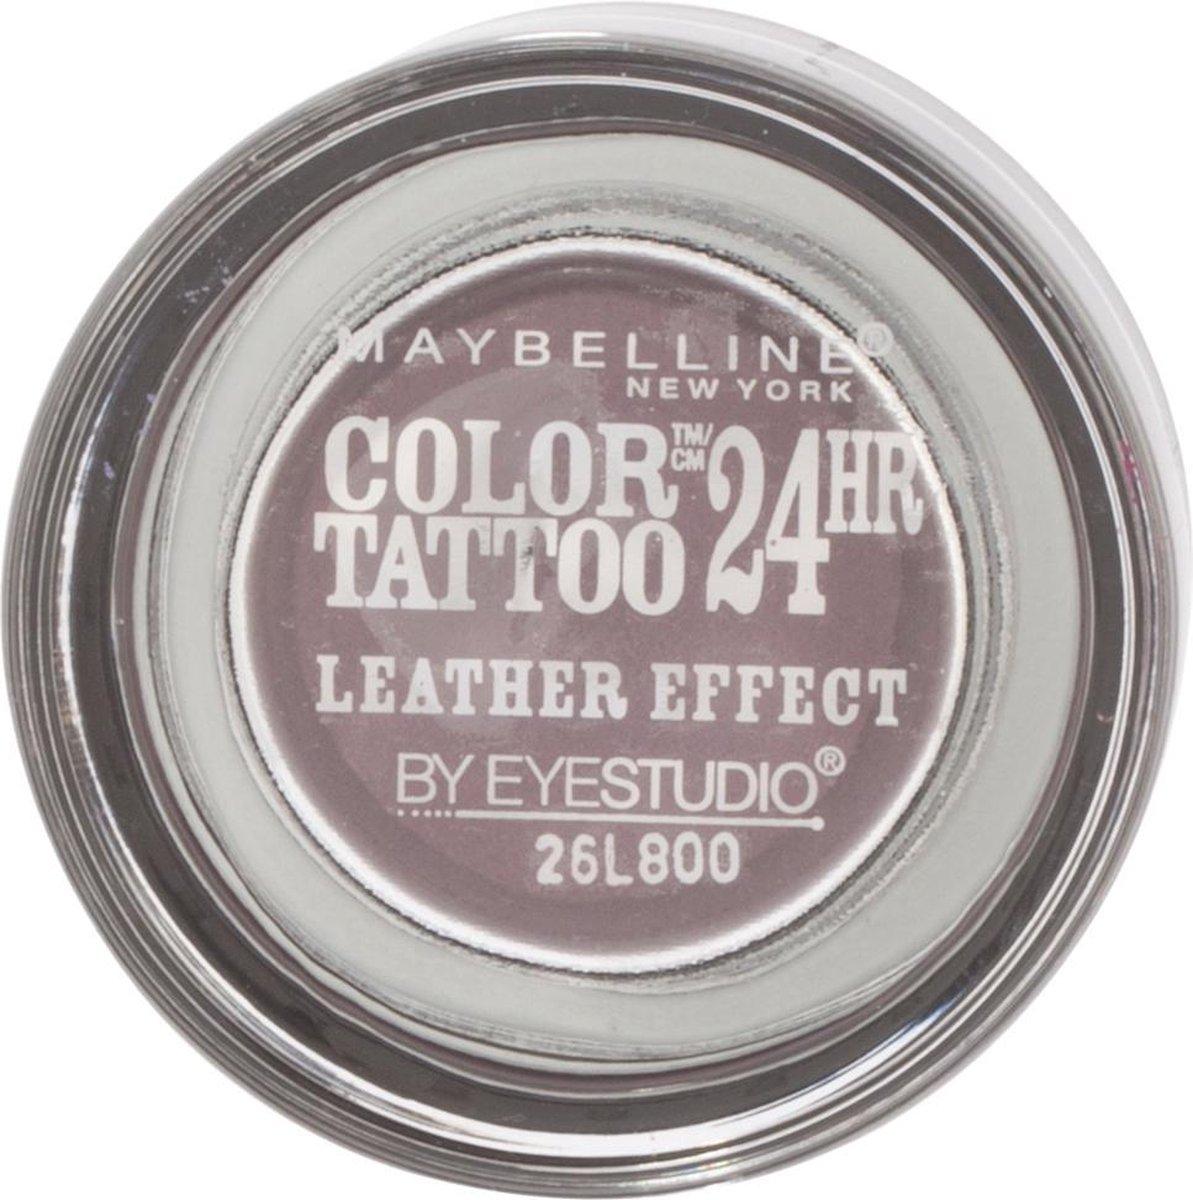 Maybelline Color Tattoo Leather 97 Vintage Plum oogschaduw Violet Shimmer - Maybelline